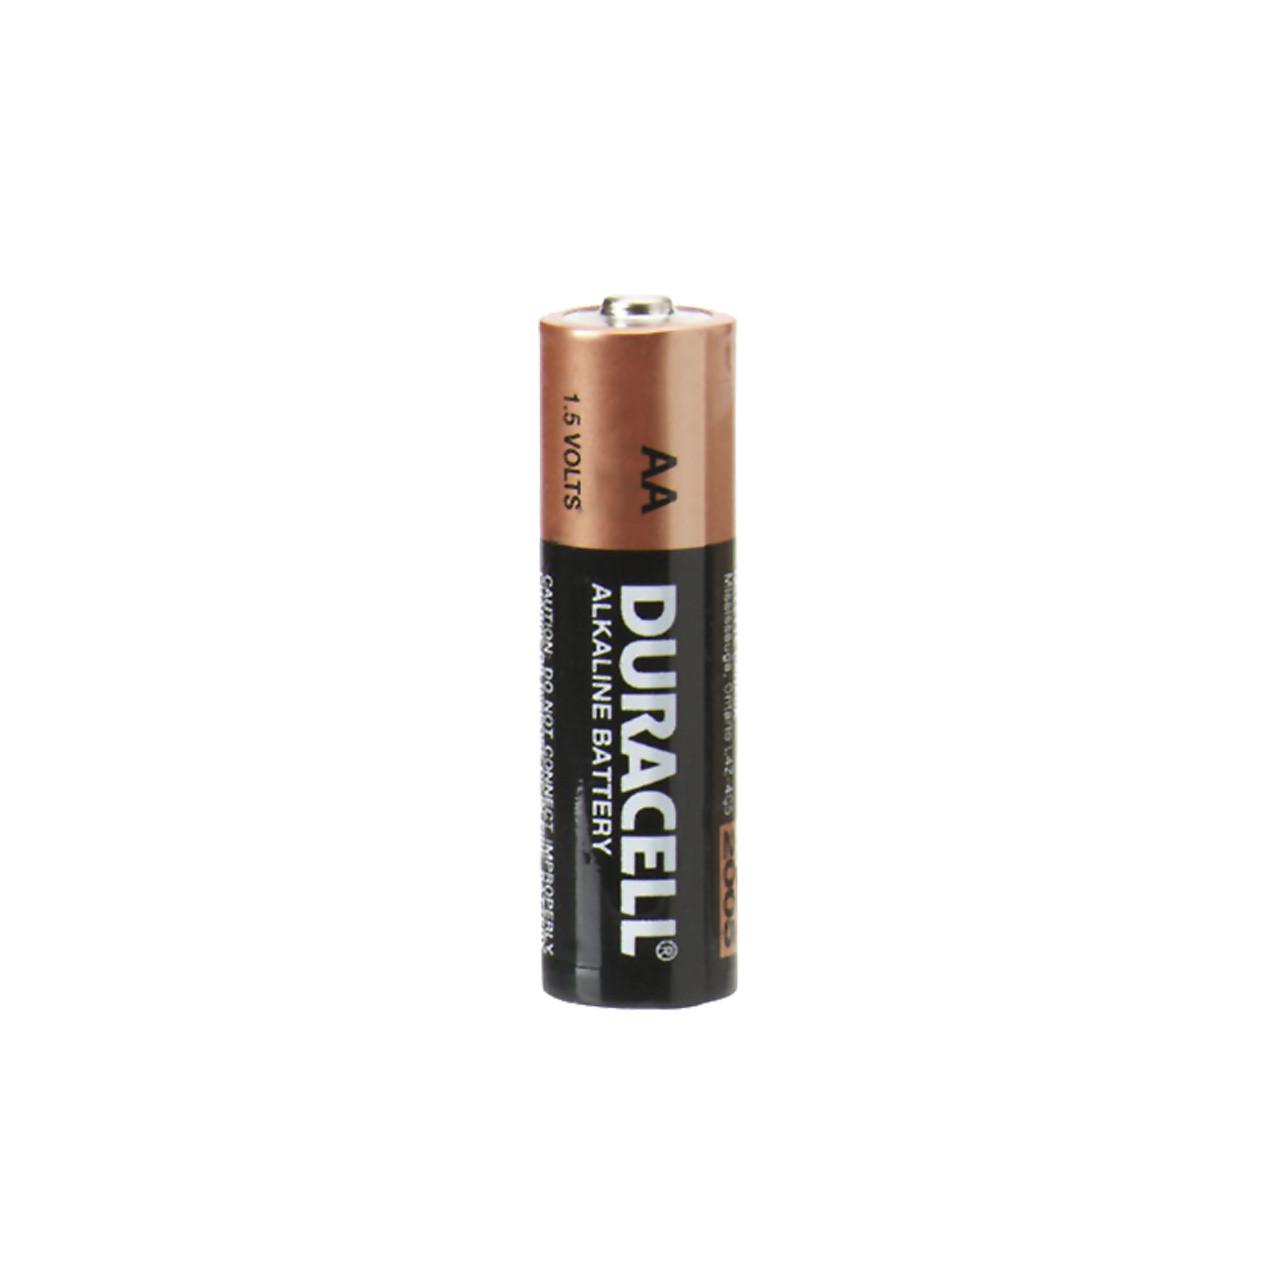 Duracell Aa Battery 10 Year Shelf Life Emergencykits Com